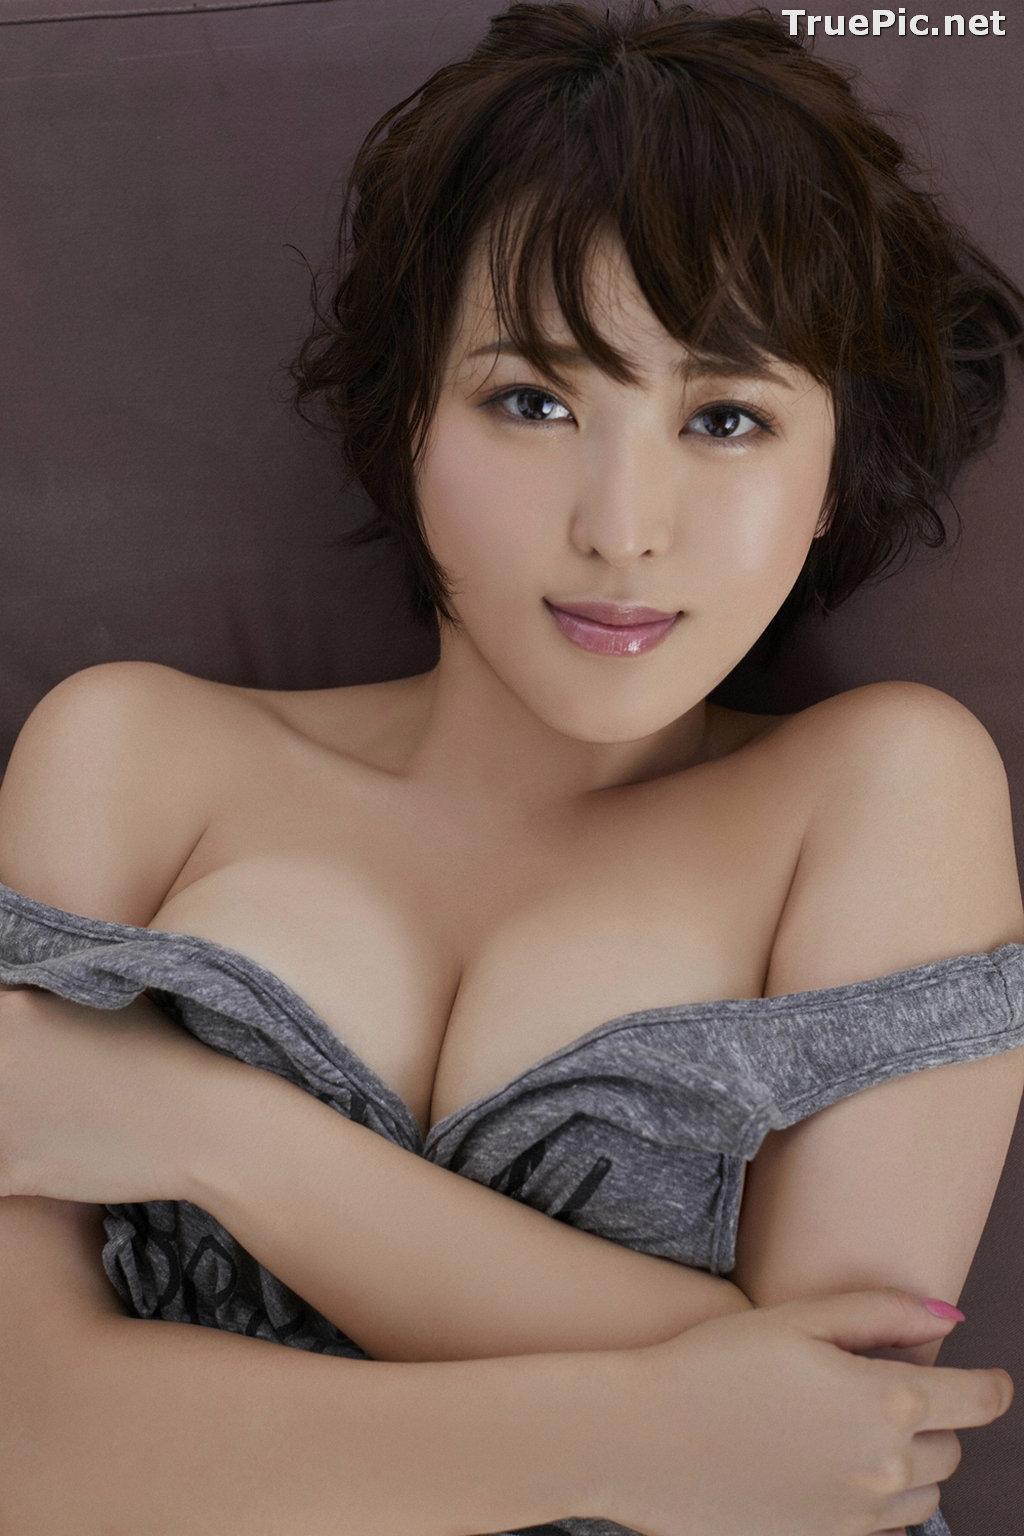 Image Japanese Beautiful Model - Sara Oshino - [YS Web] Vol.797 - TruePic.net - Picture-9